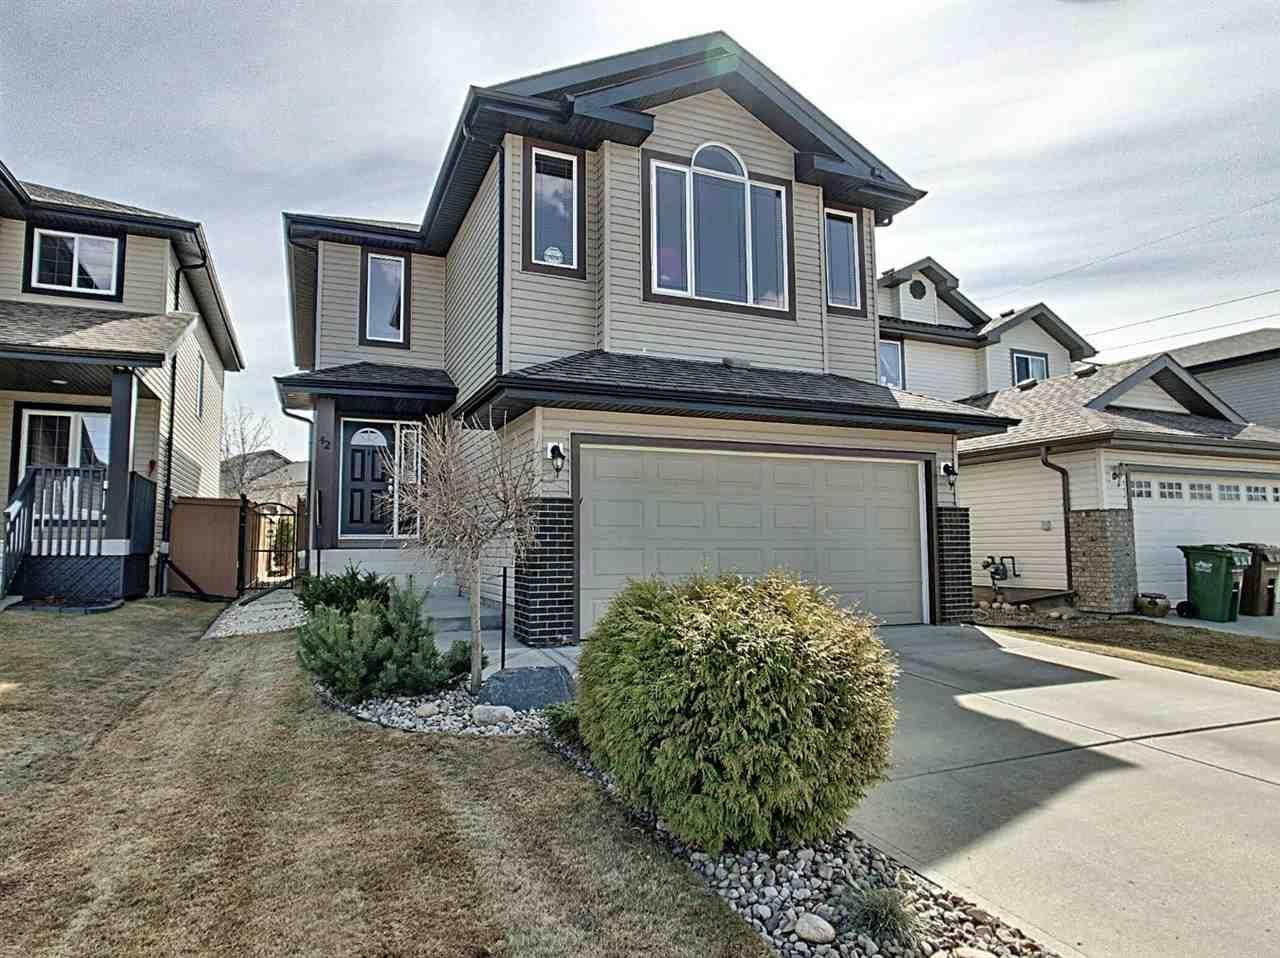 House for sale at 42 Norelle Te St. Albert Alberta - MLS: E4195245